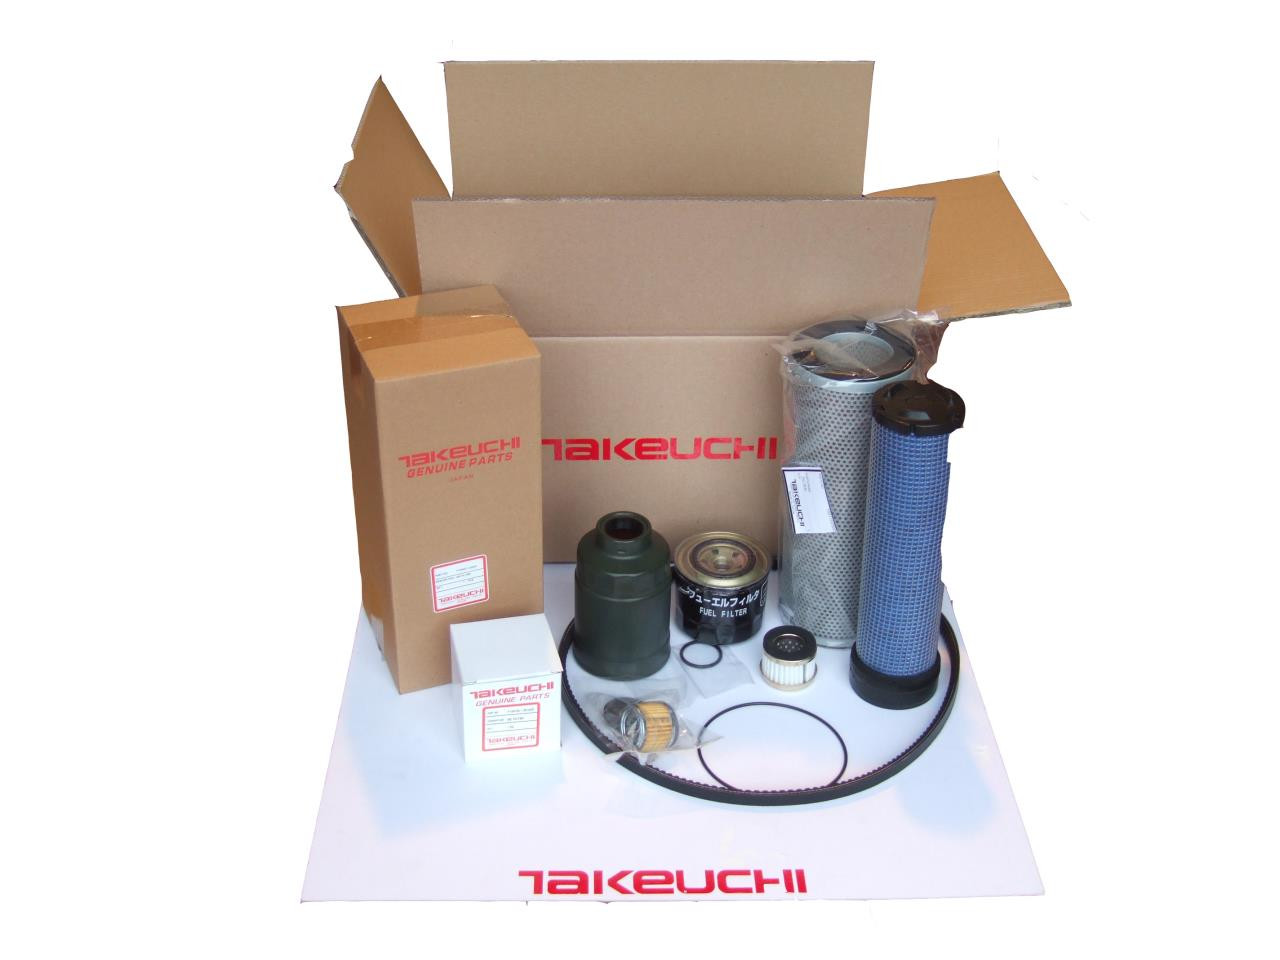 Takeuchi TB235 filtersæt